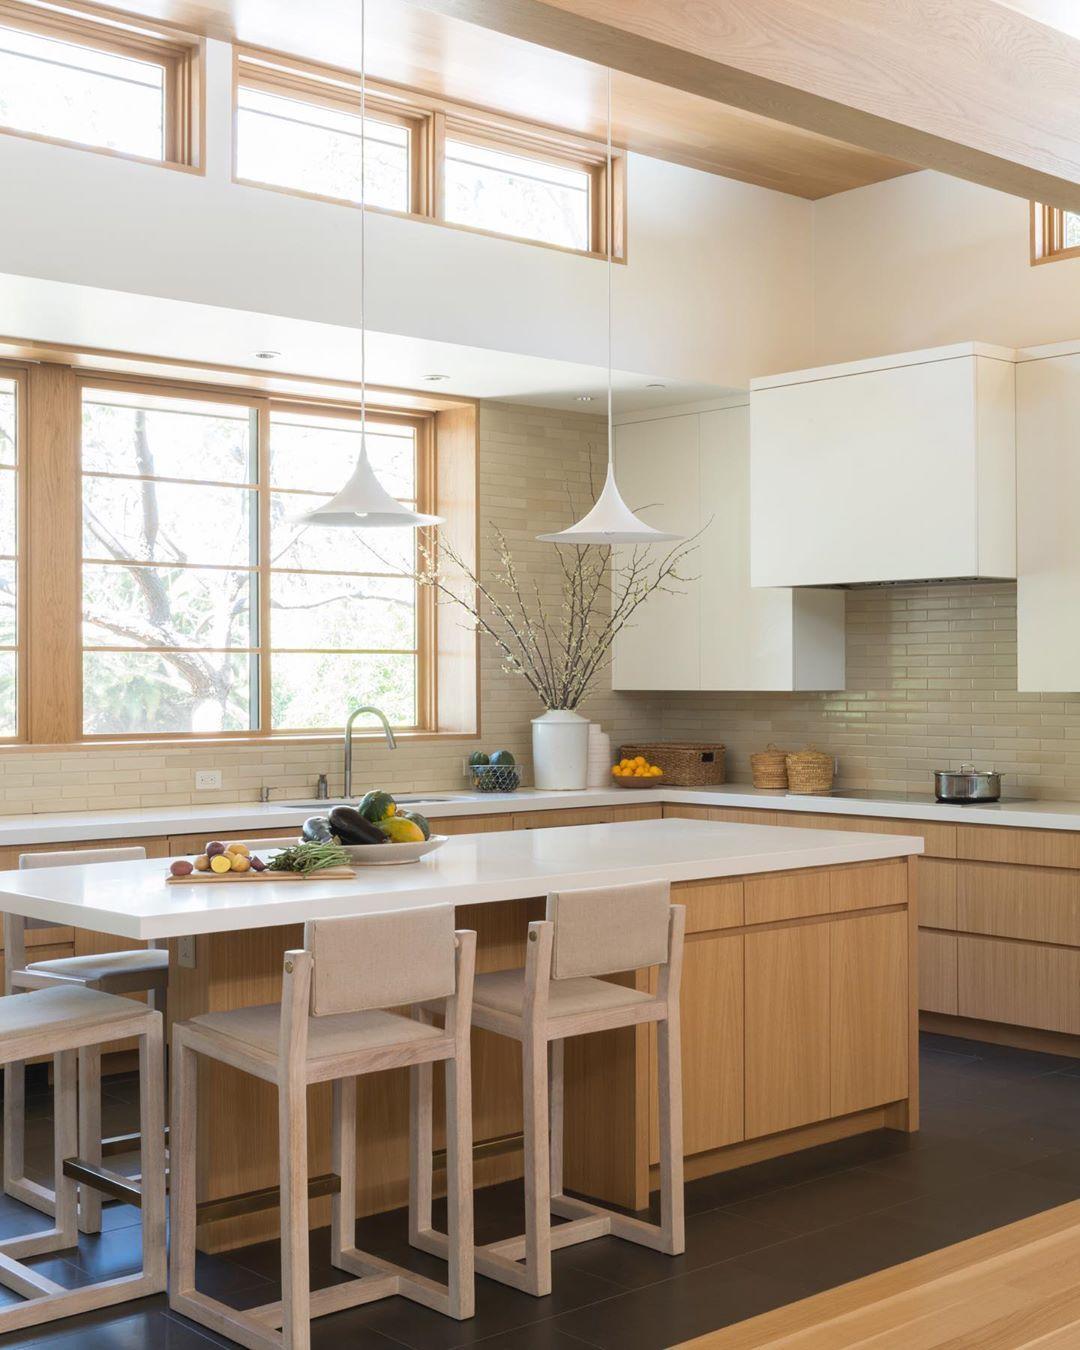 Disc Interiors On Instagram Pasadena Kitchen Designed By Disc Interiors Discinteriors Kitchen Des Disc Interiors Kitchen Interior Interior Design Kitchen